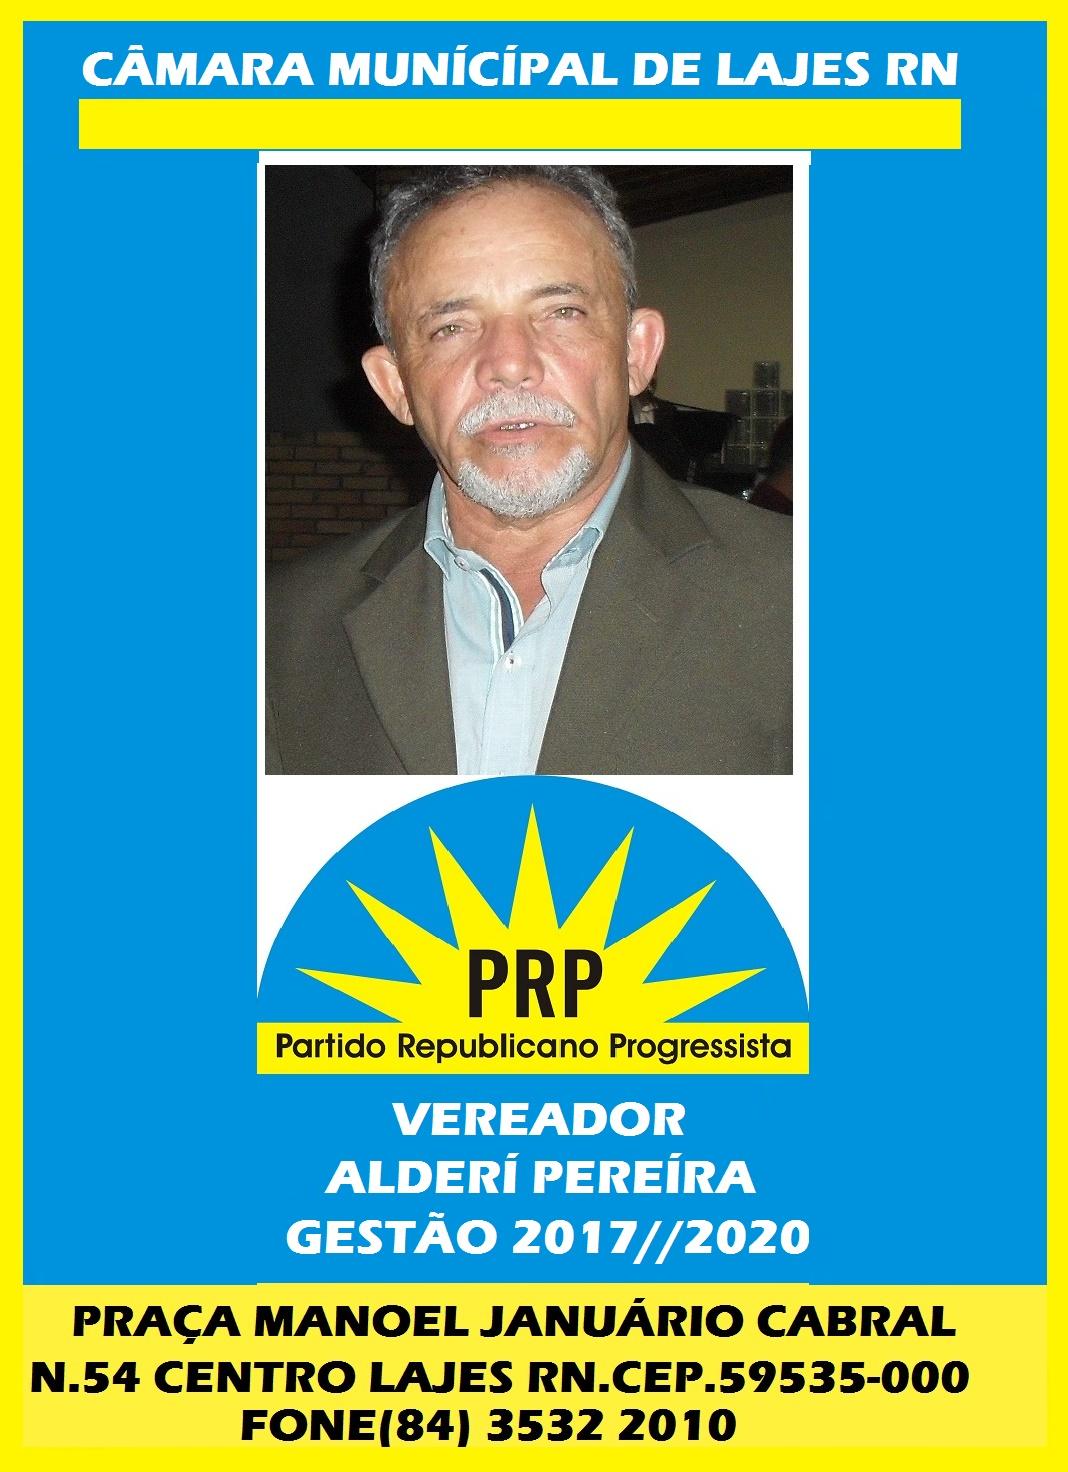 VEREADOR ALDERÍ PEREIRA LAJES DO CABUGI RN